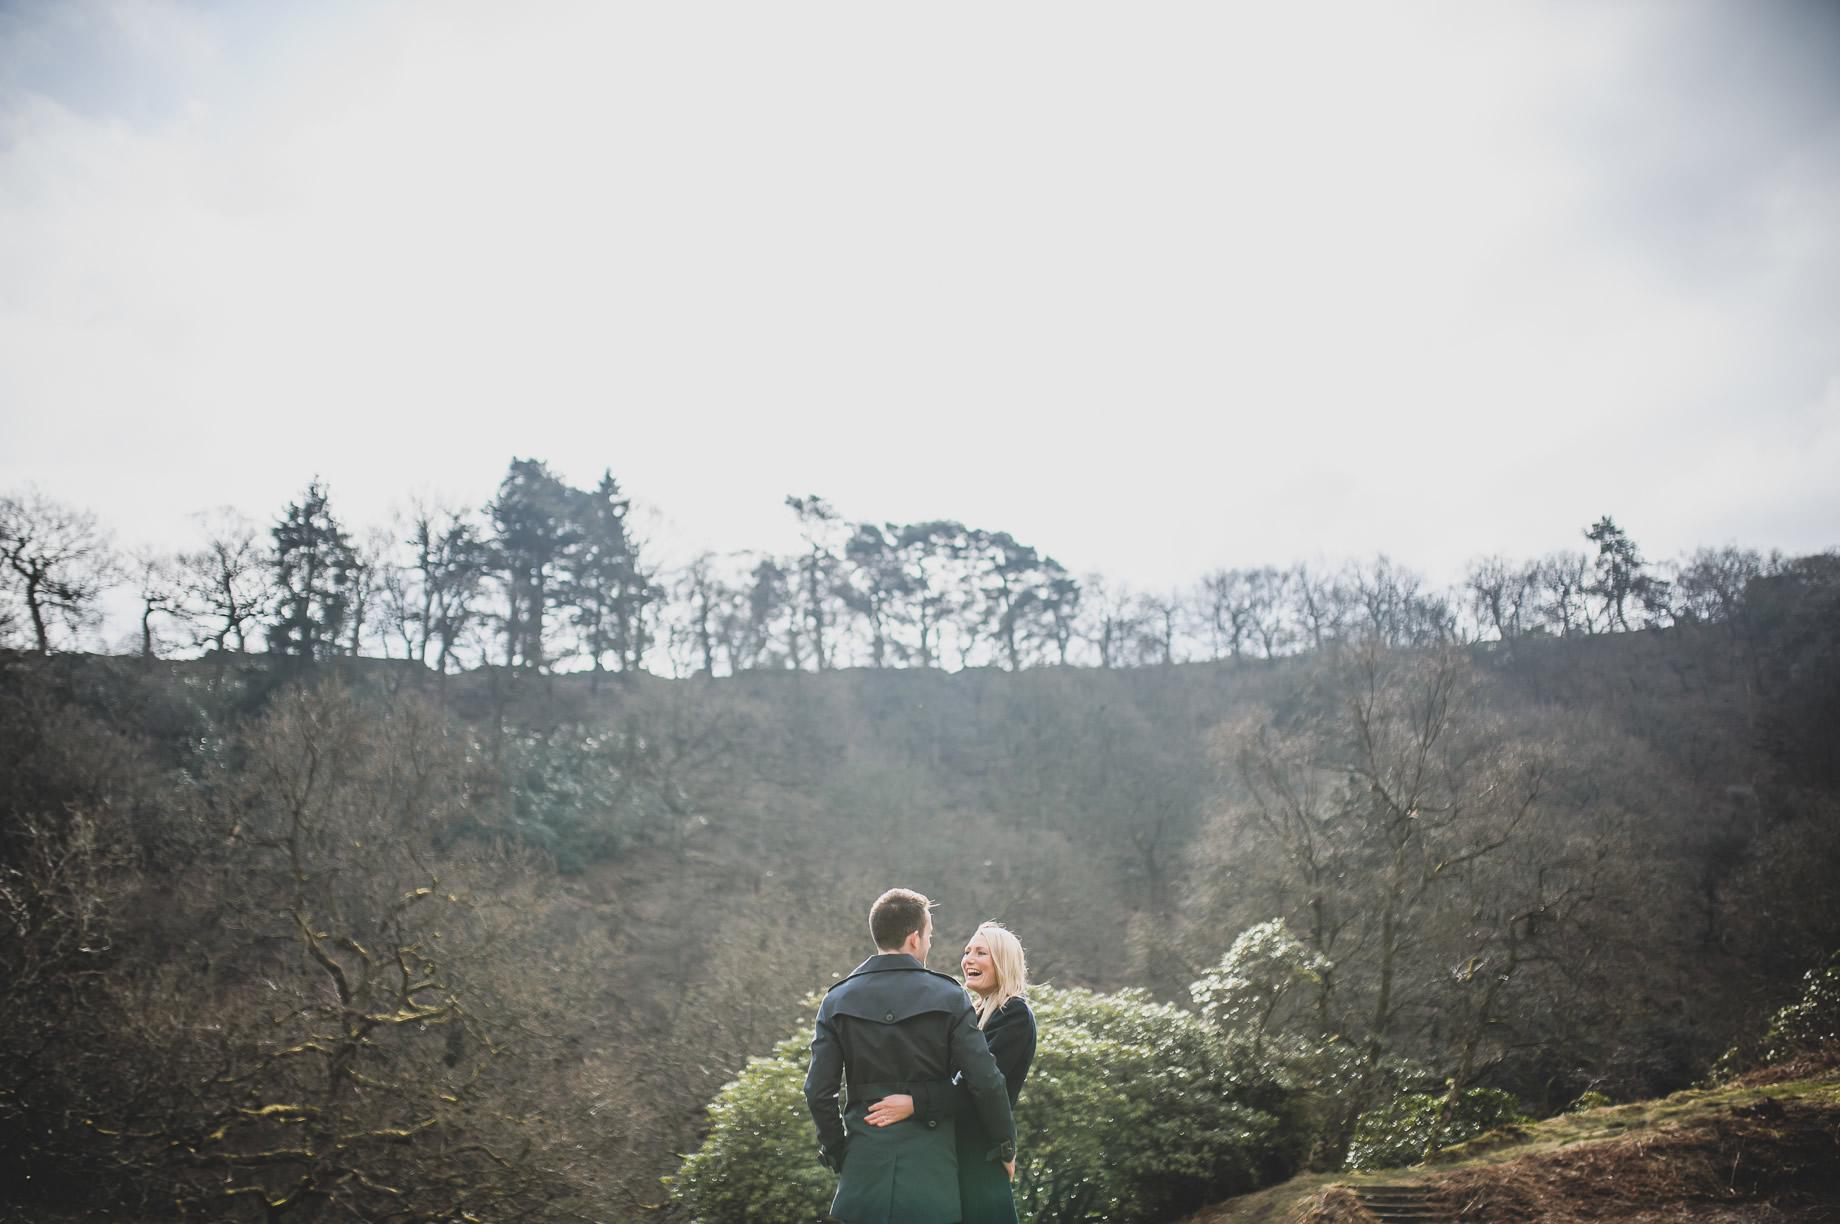 Rachel and Christian Pre-Wedding Shoot at Errwood Hall Ruins 012